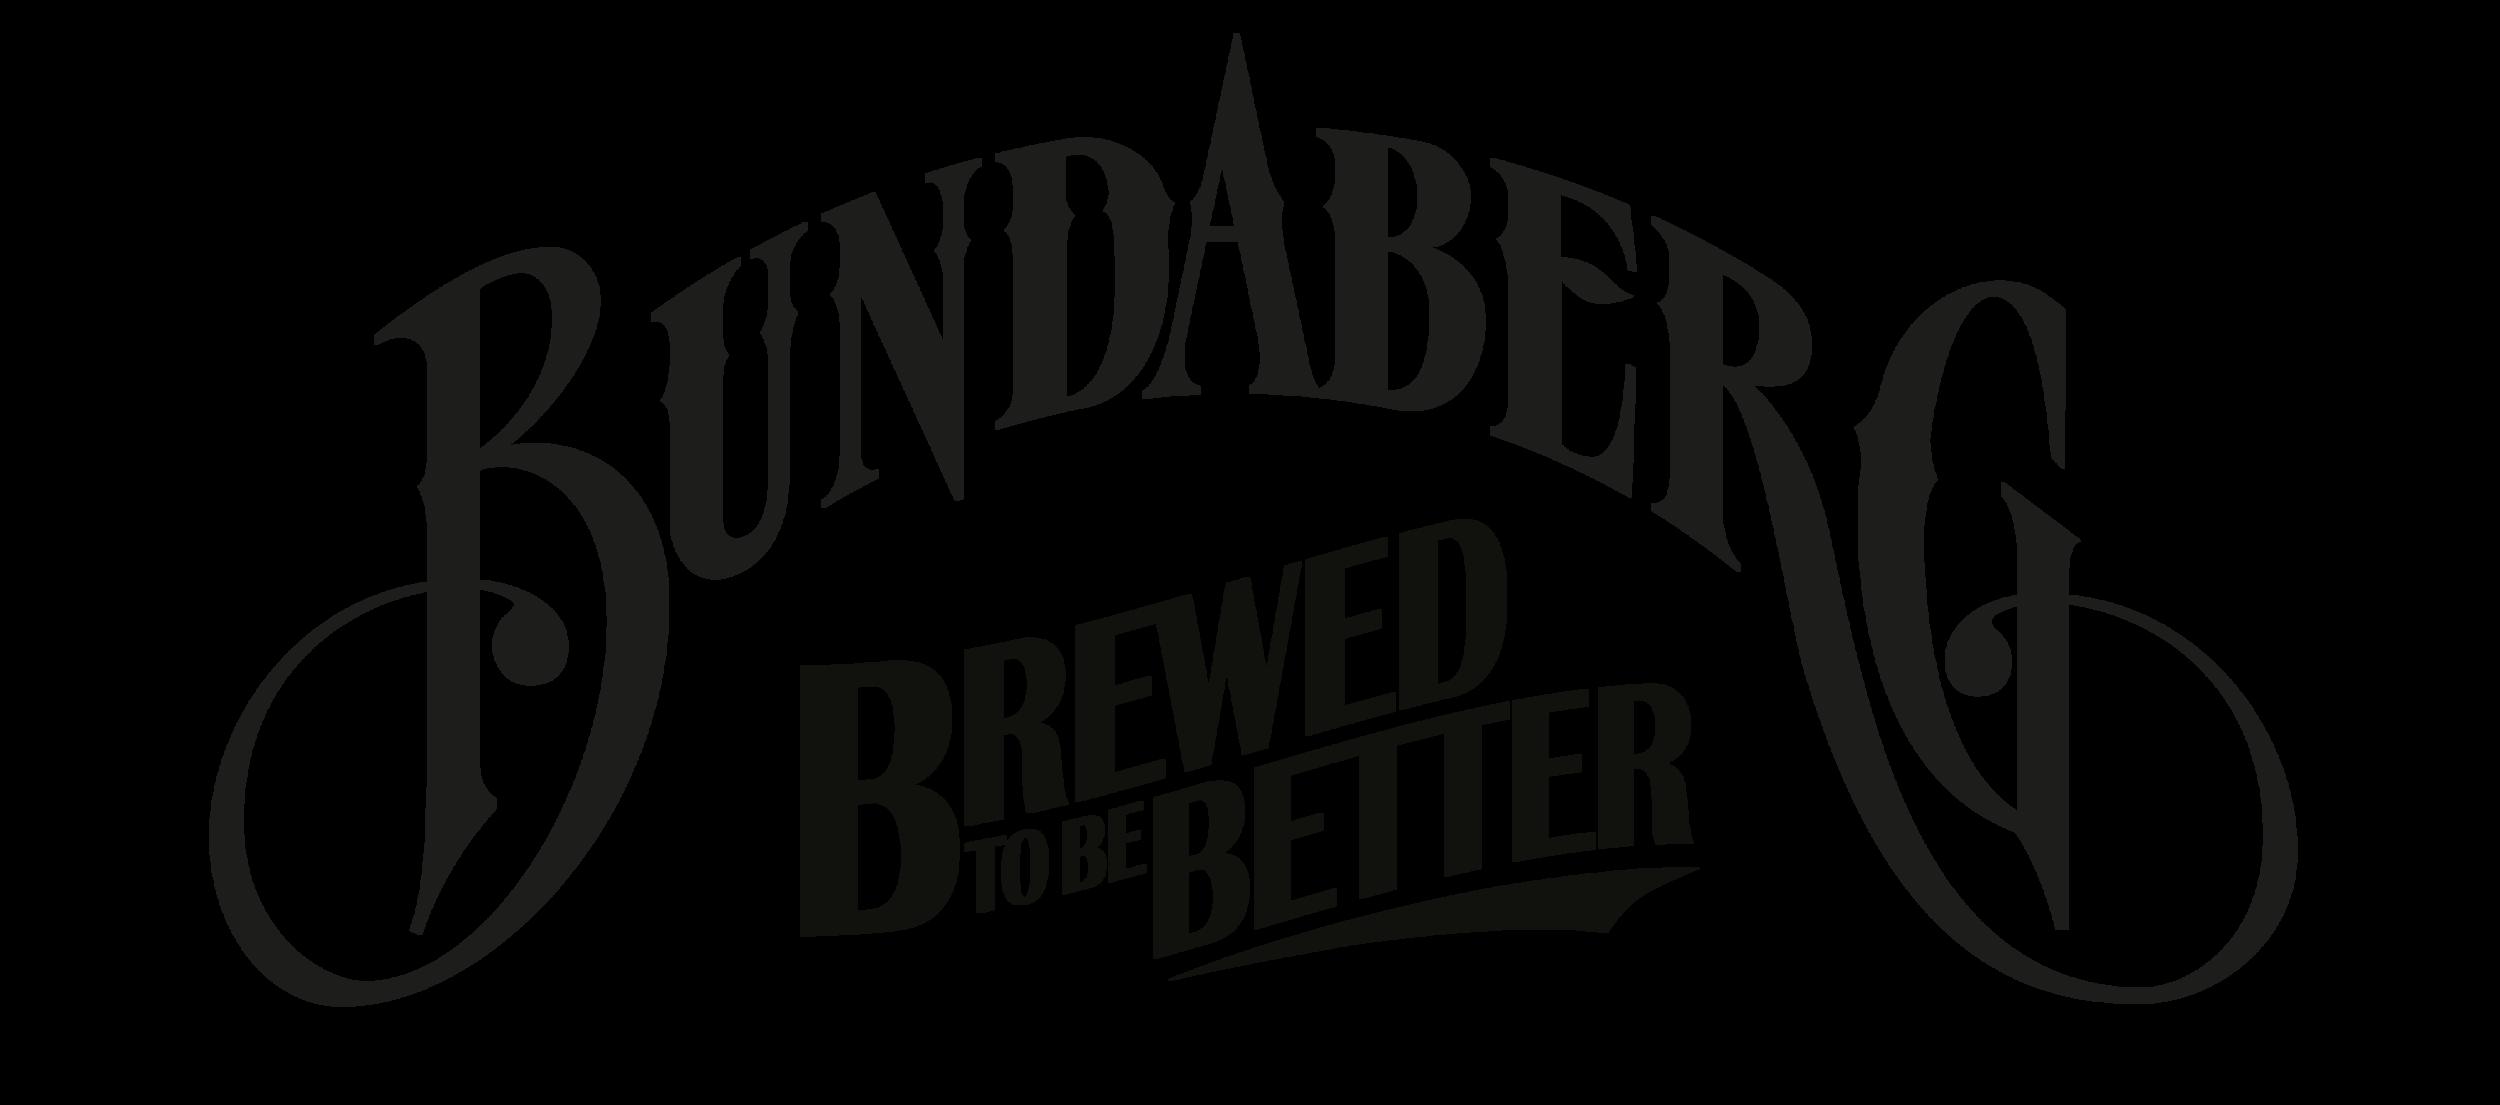 Bundaberg Brewed to be Better Master Logo.png